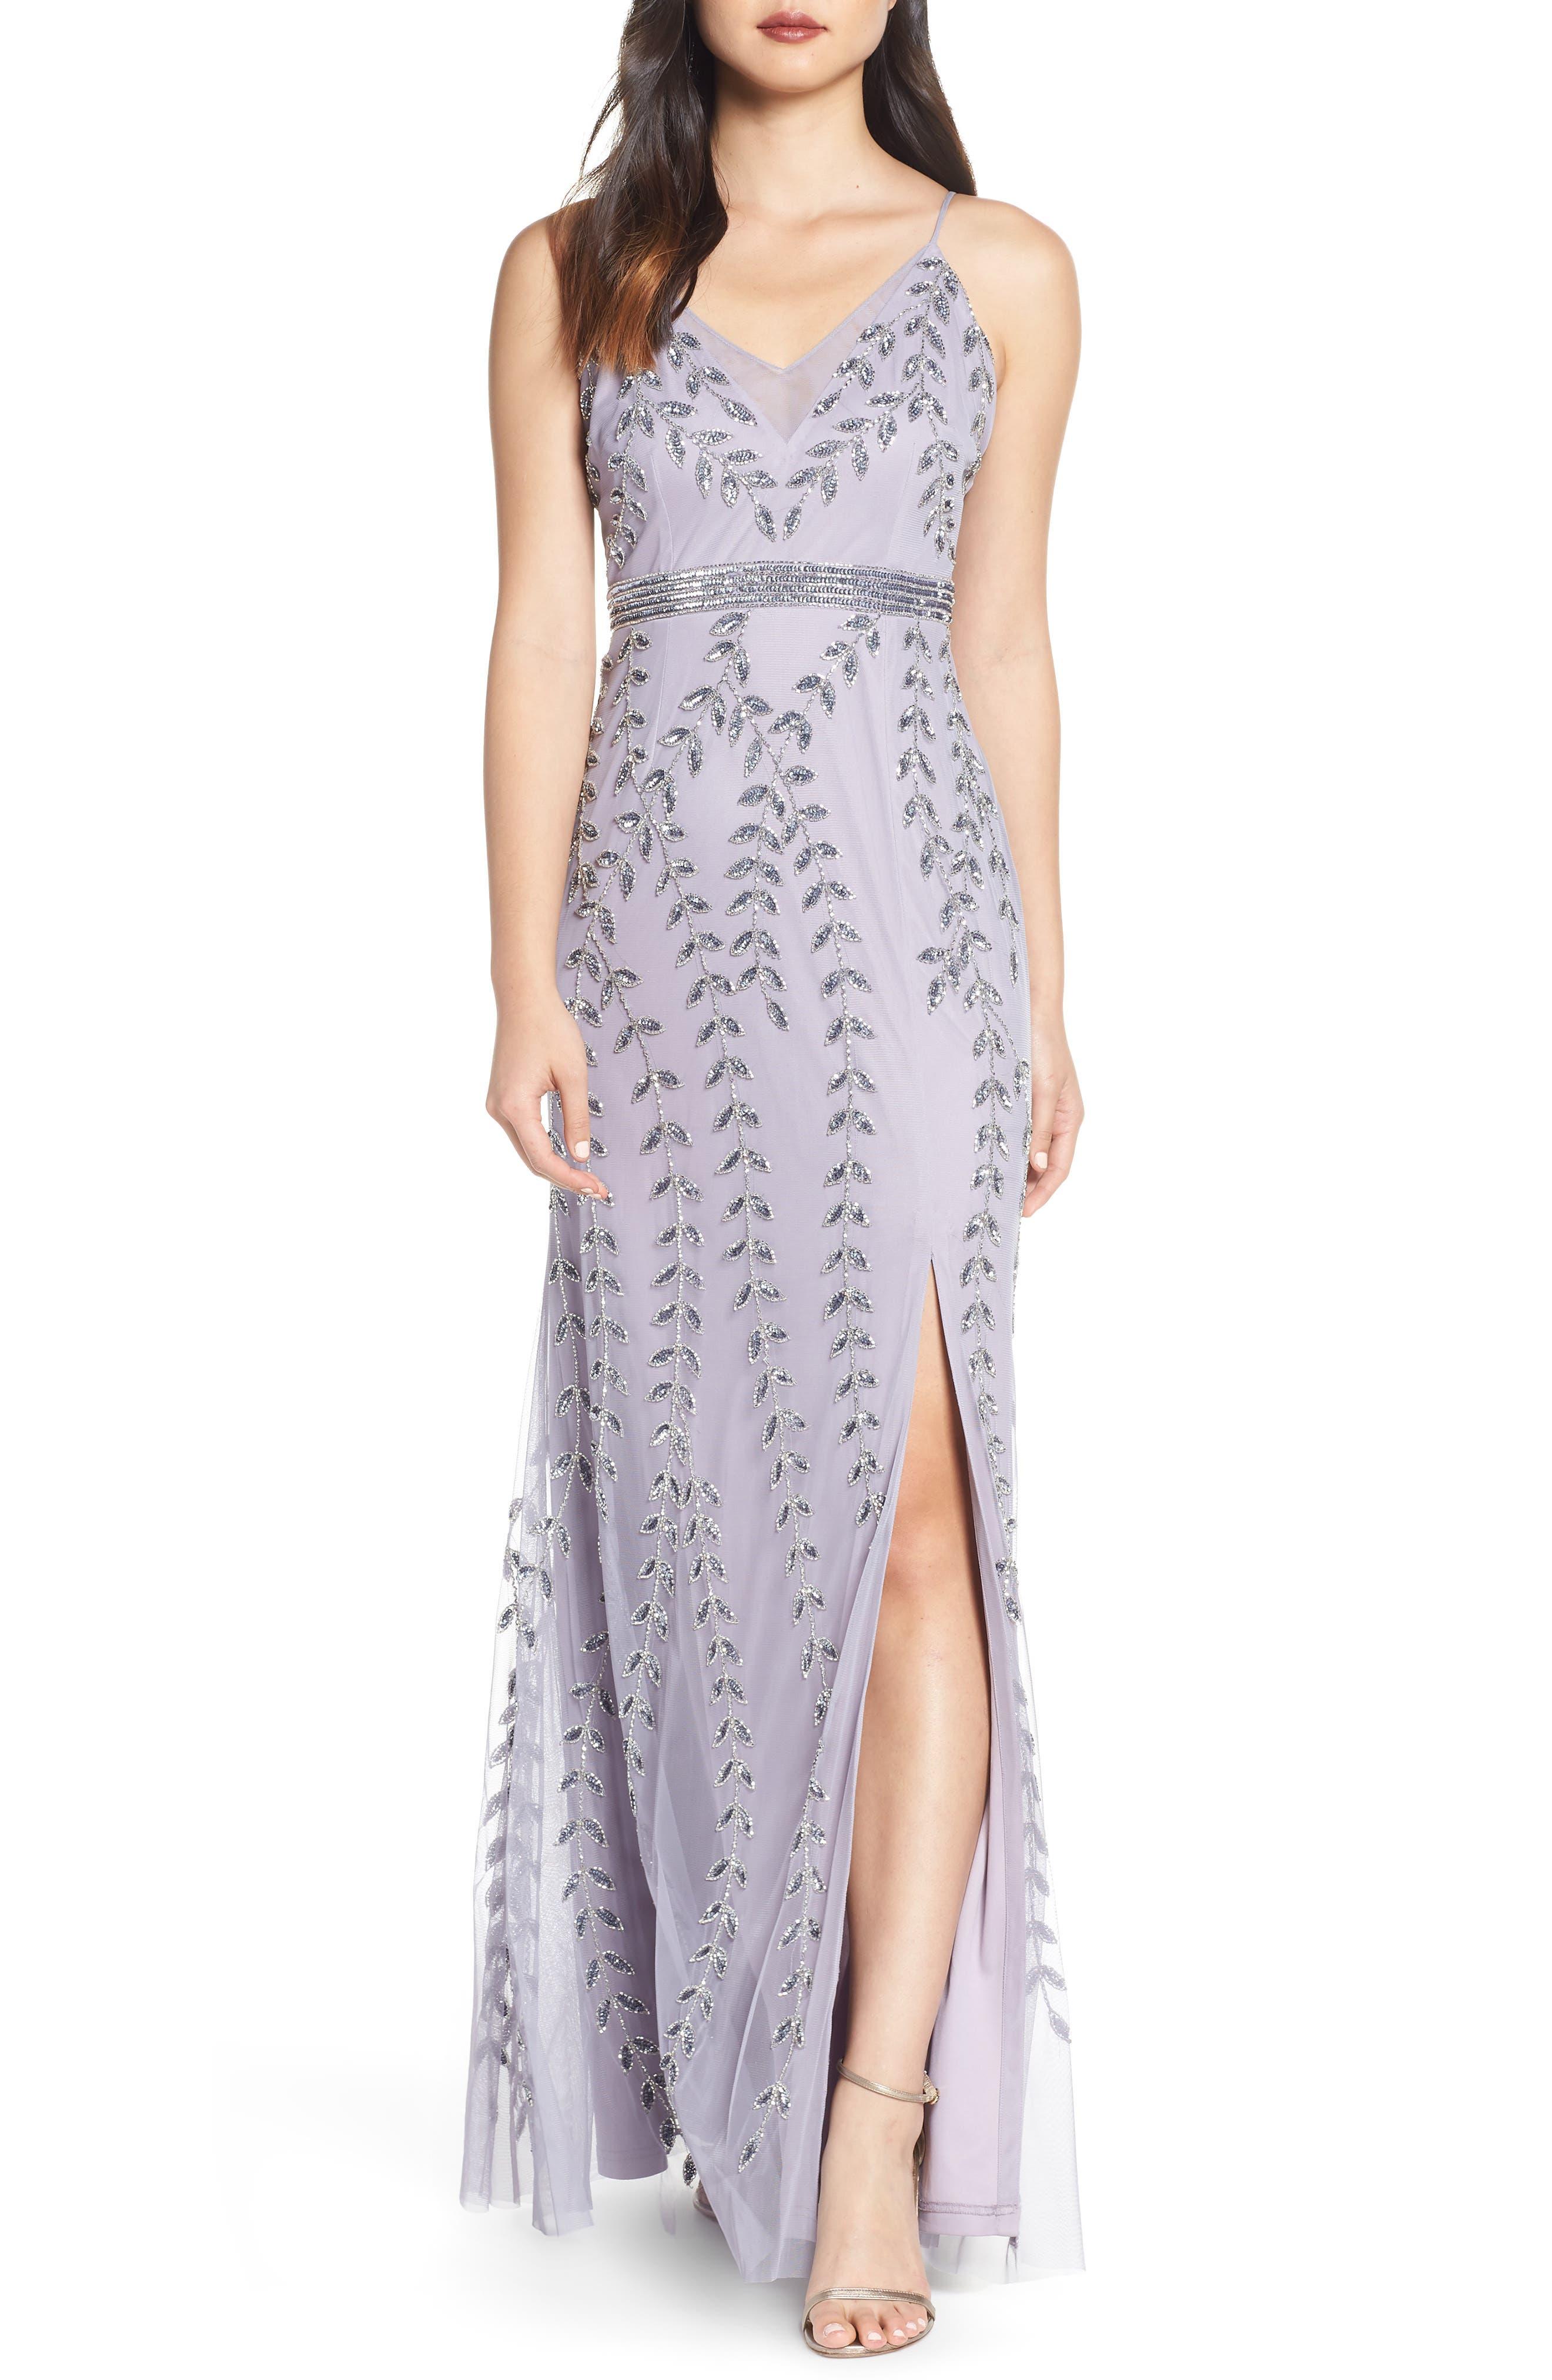 Adrianna Papell Vine Motif Beaded Evening Dress, Purple